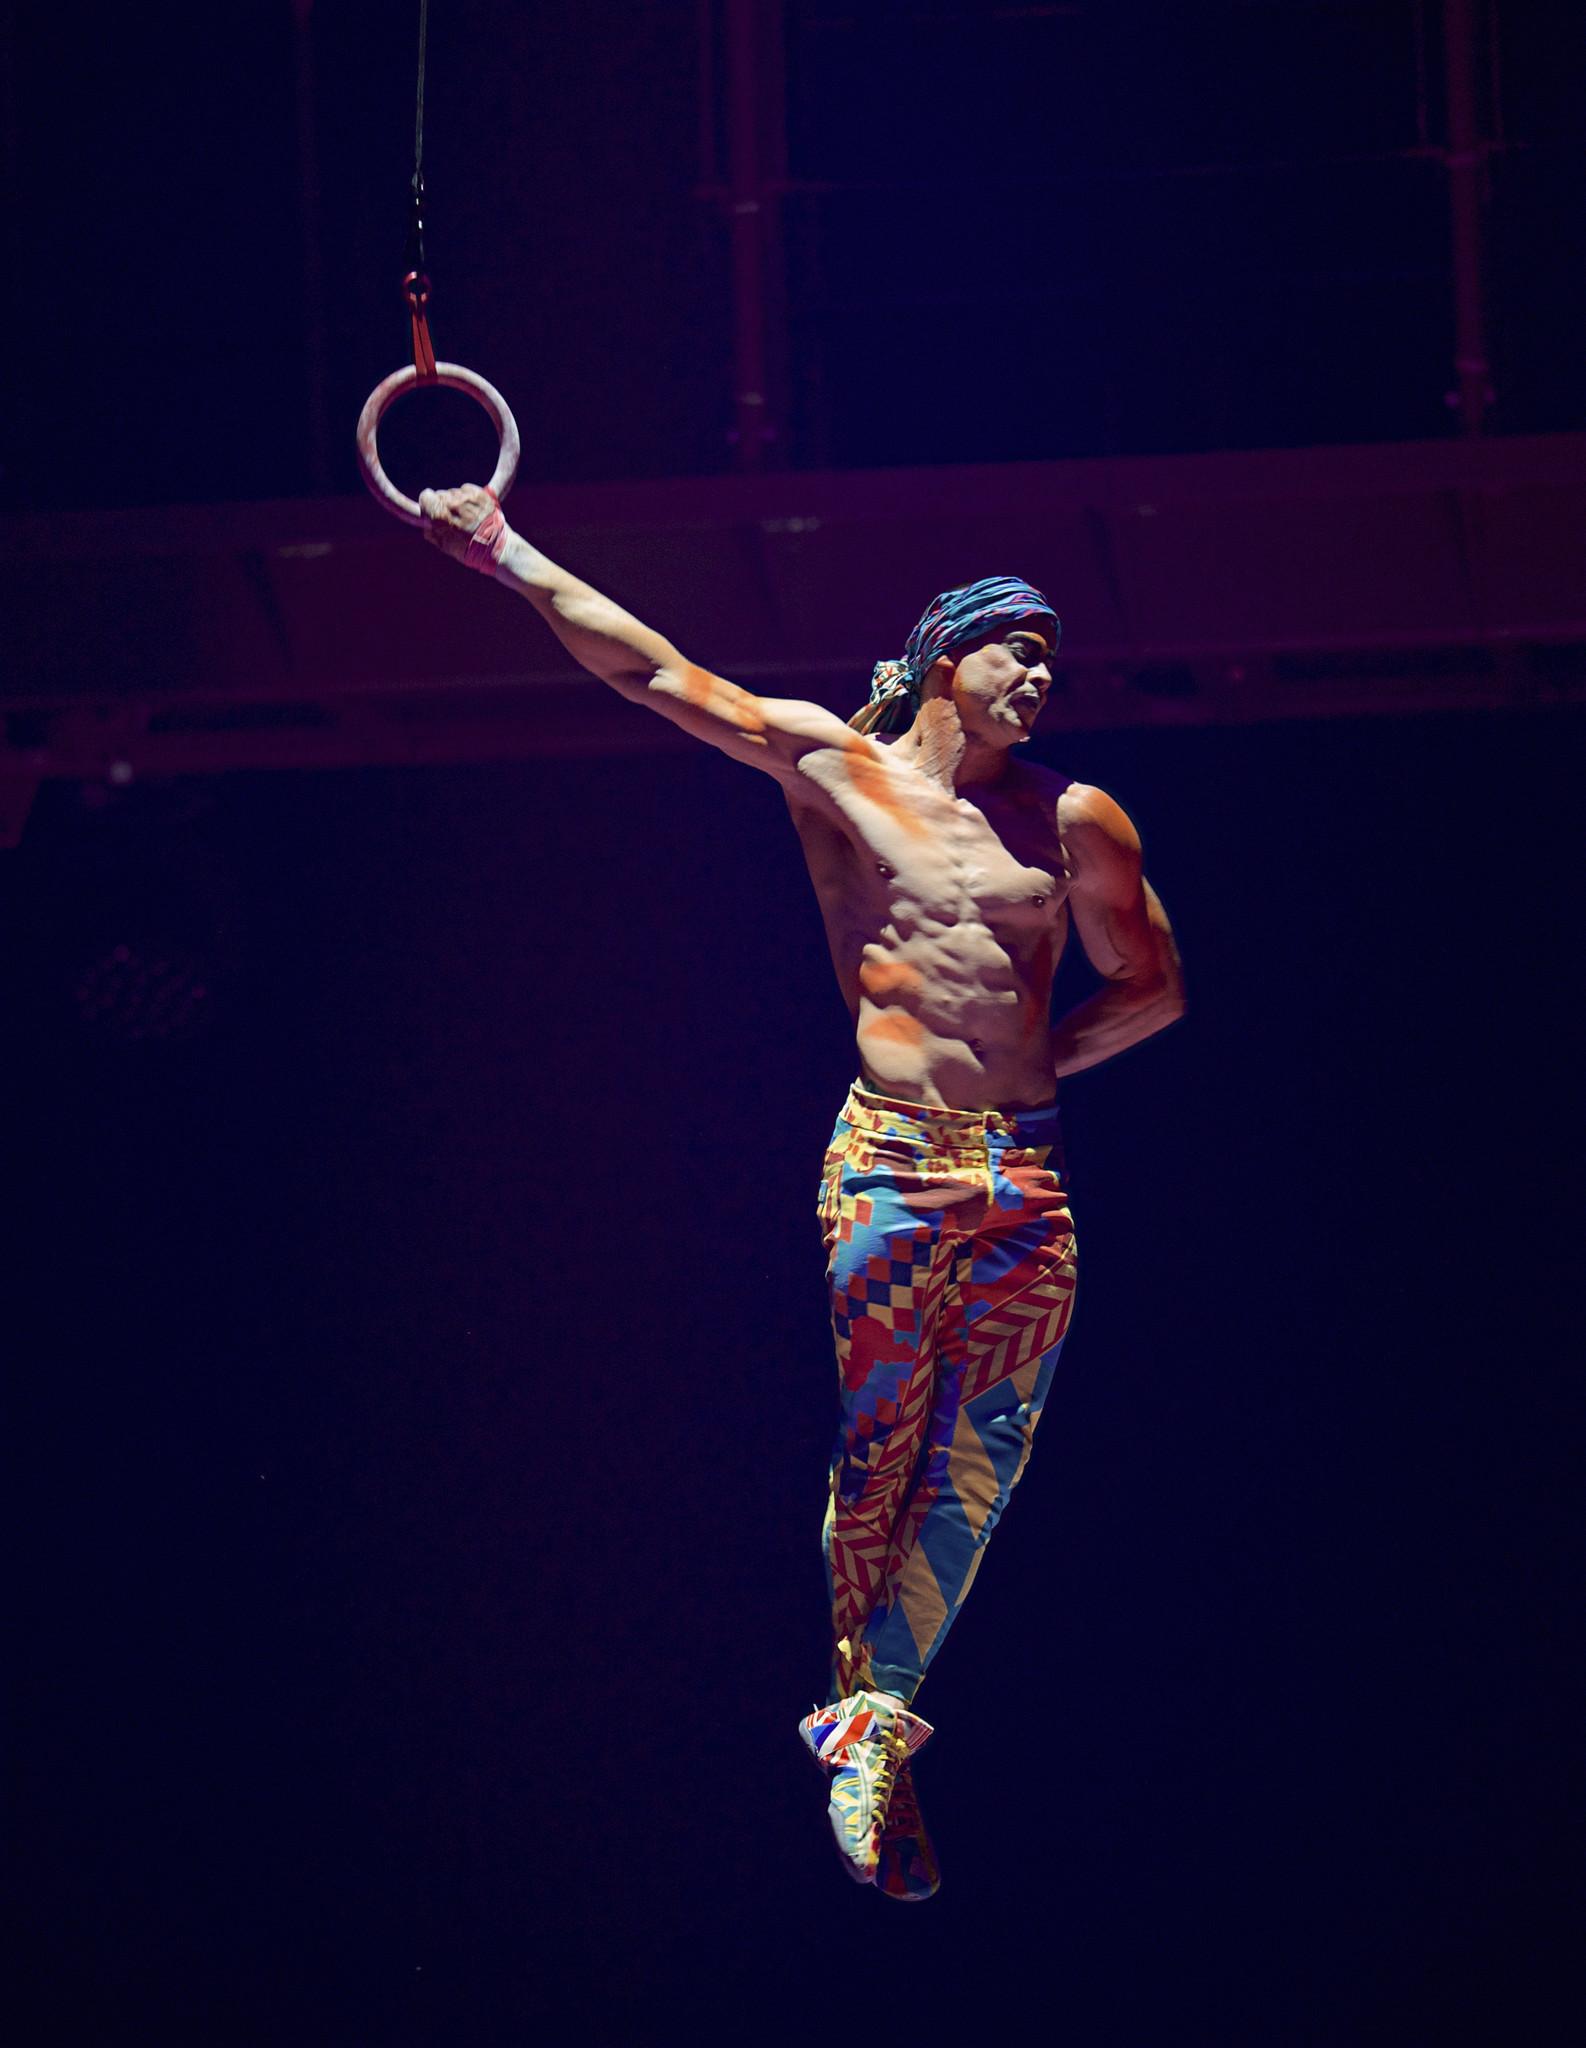 Cirque Du Soleil Chicago: Tampa Acrobat Was Attempting New Cirque Du Soleil Act. A